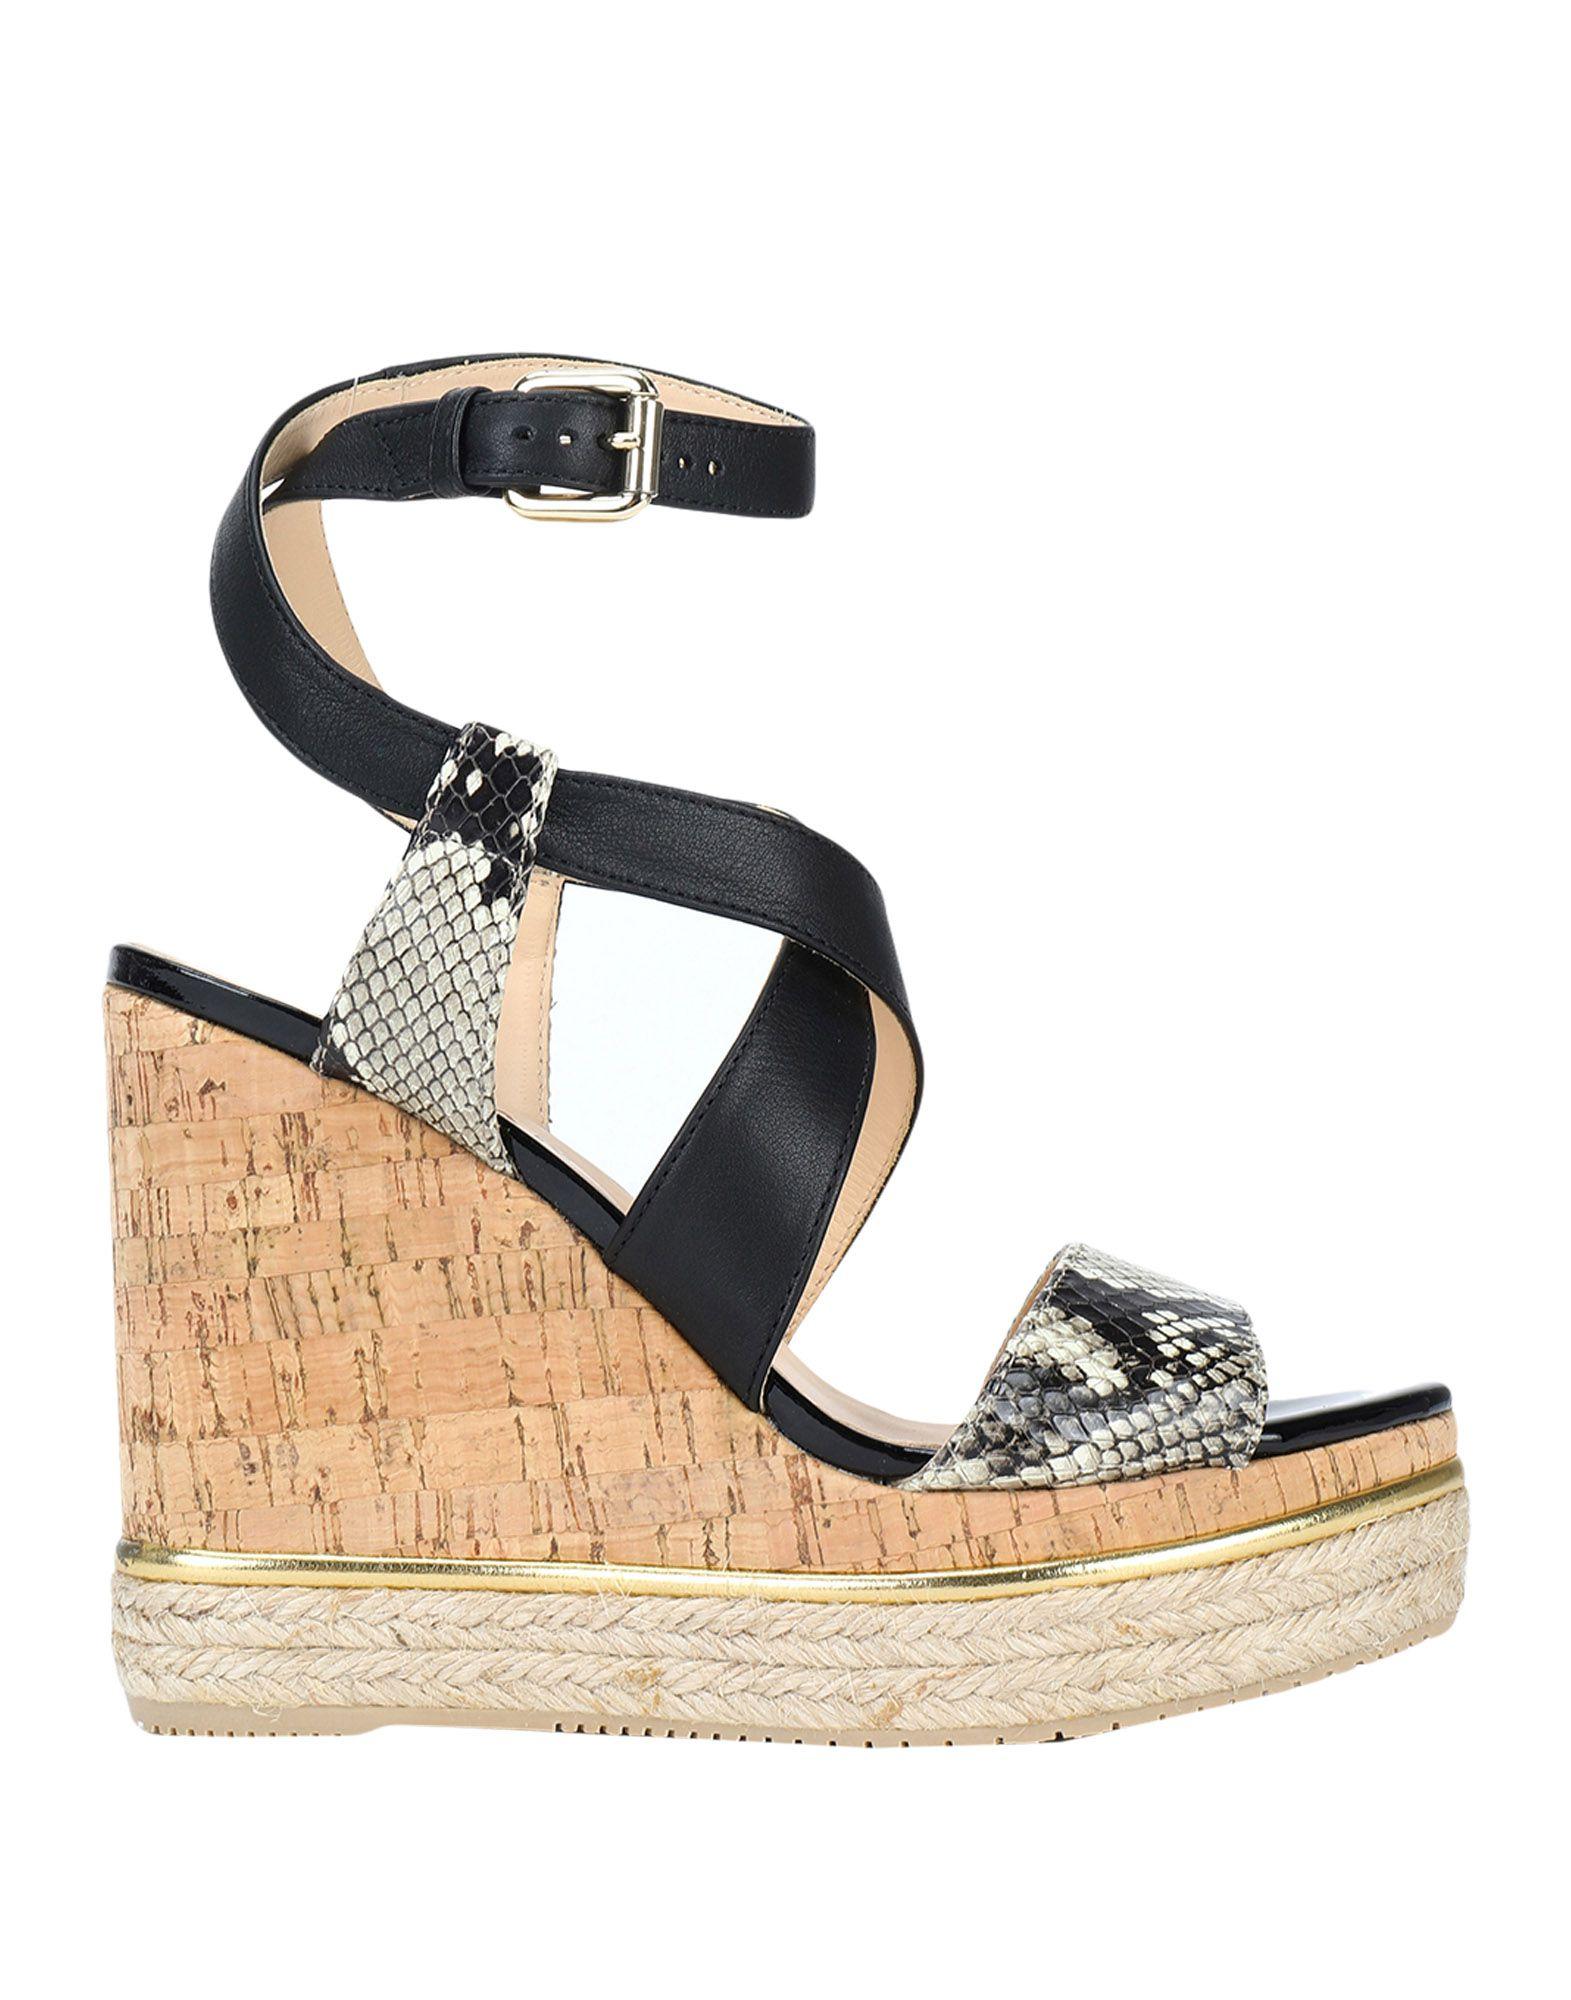 Hogan Sandals - Women Hogan Sandals online on 11566668IR  United Kingdom - 11566668IR on a0e06a